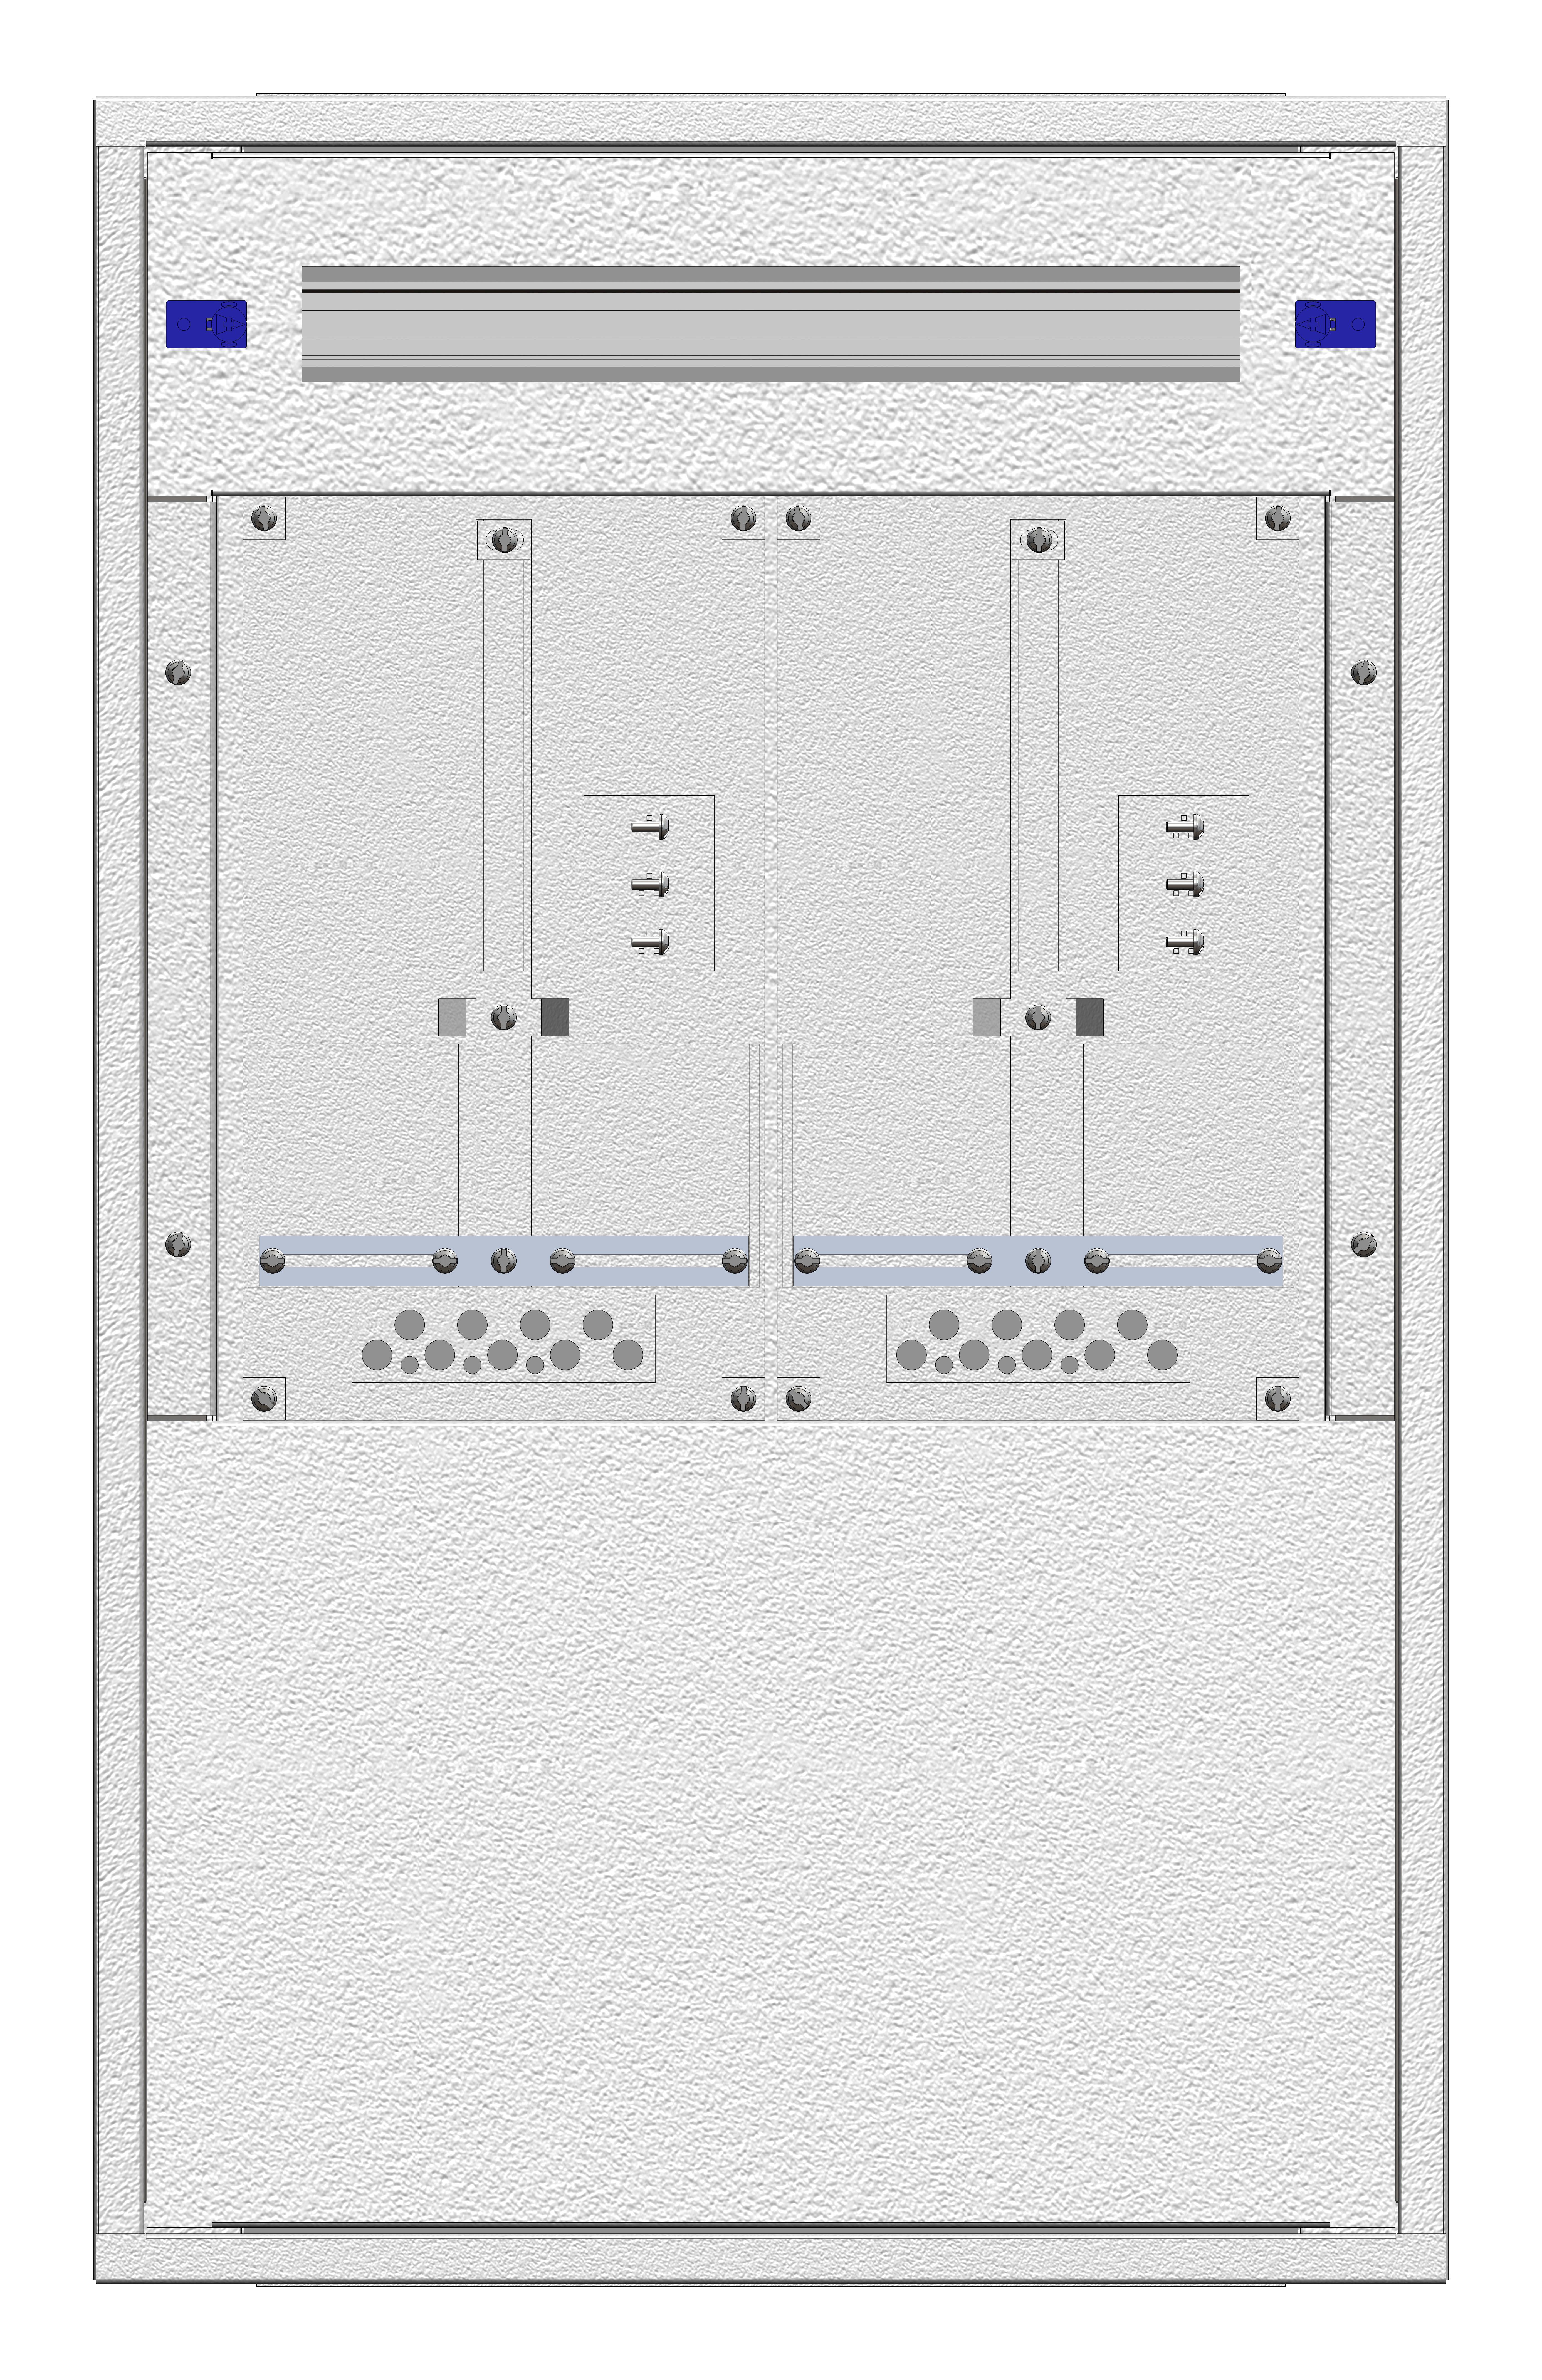 1 Stk Aufputz-Zählerverteiler 2A-18E/NOE 2ZP, H915B590T250mm IL160218NS